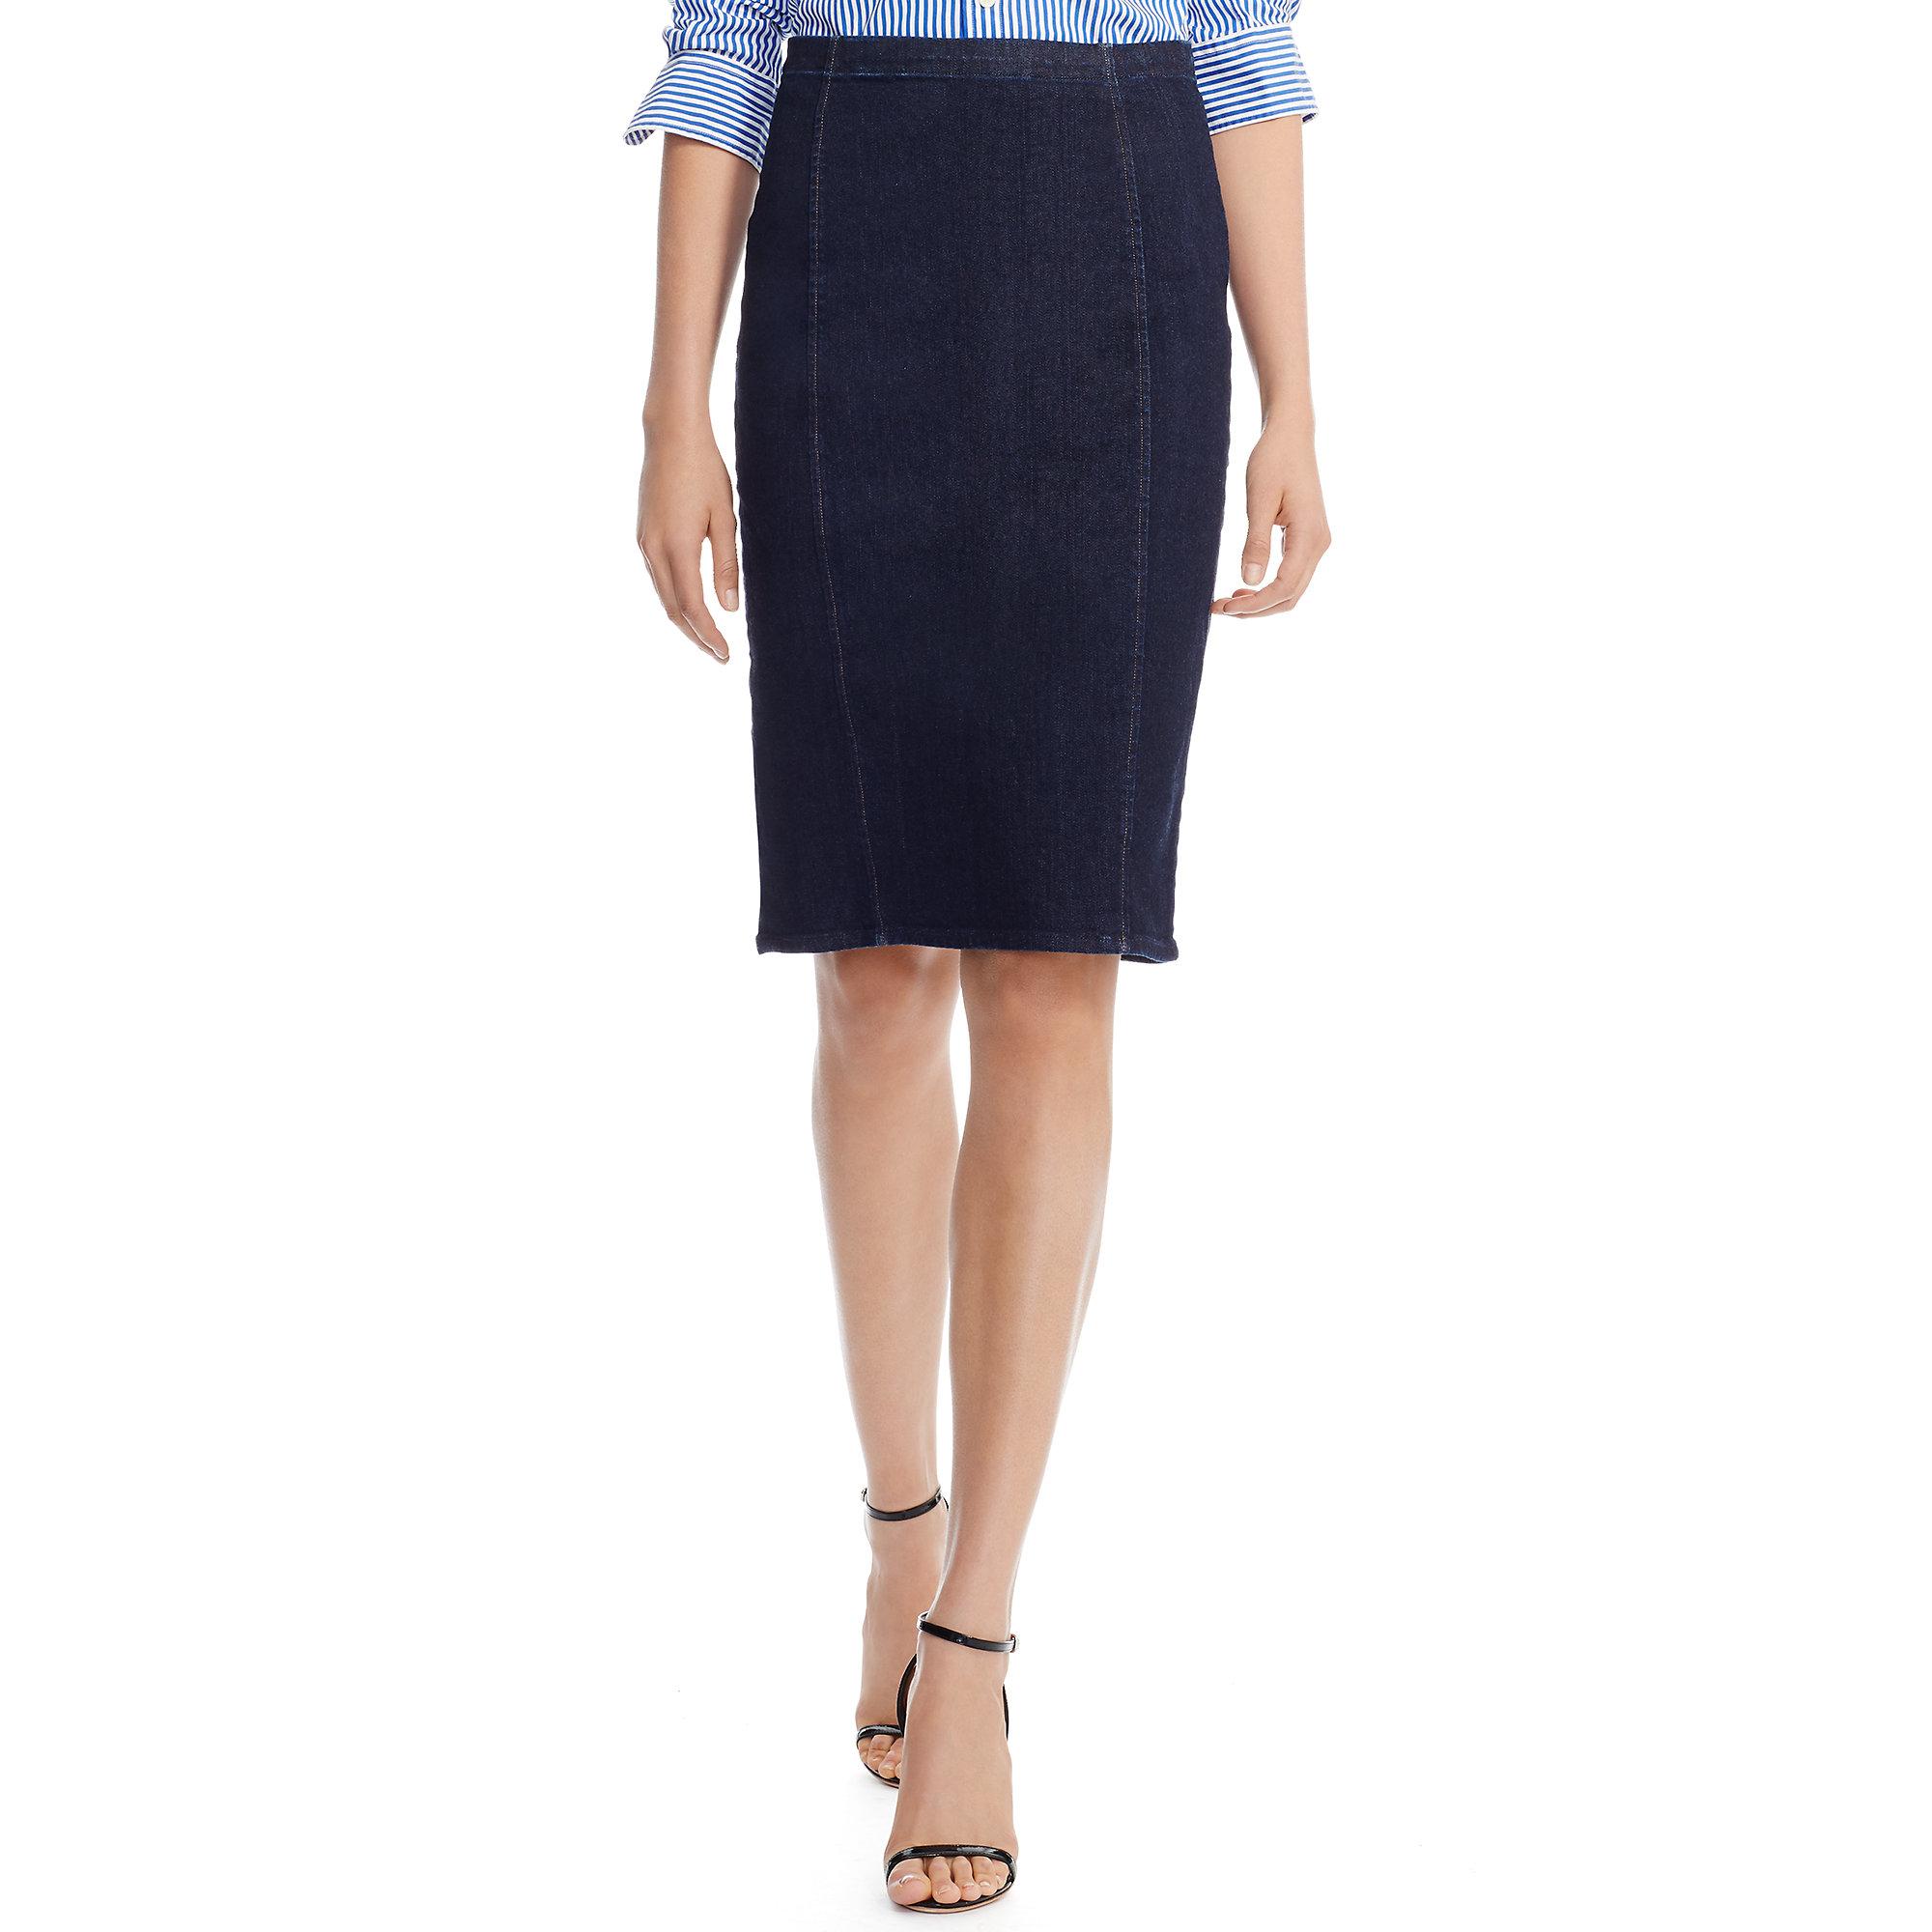 Polo ralph lauren Denim Pencil Skirt in Blue | Lyst